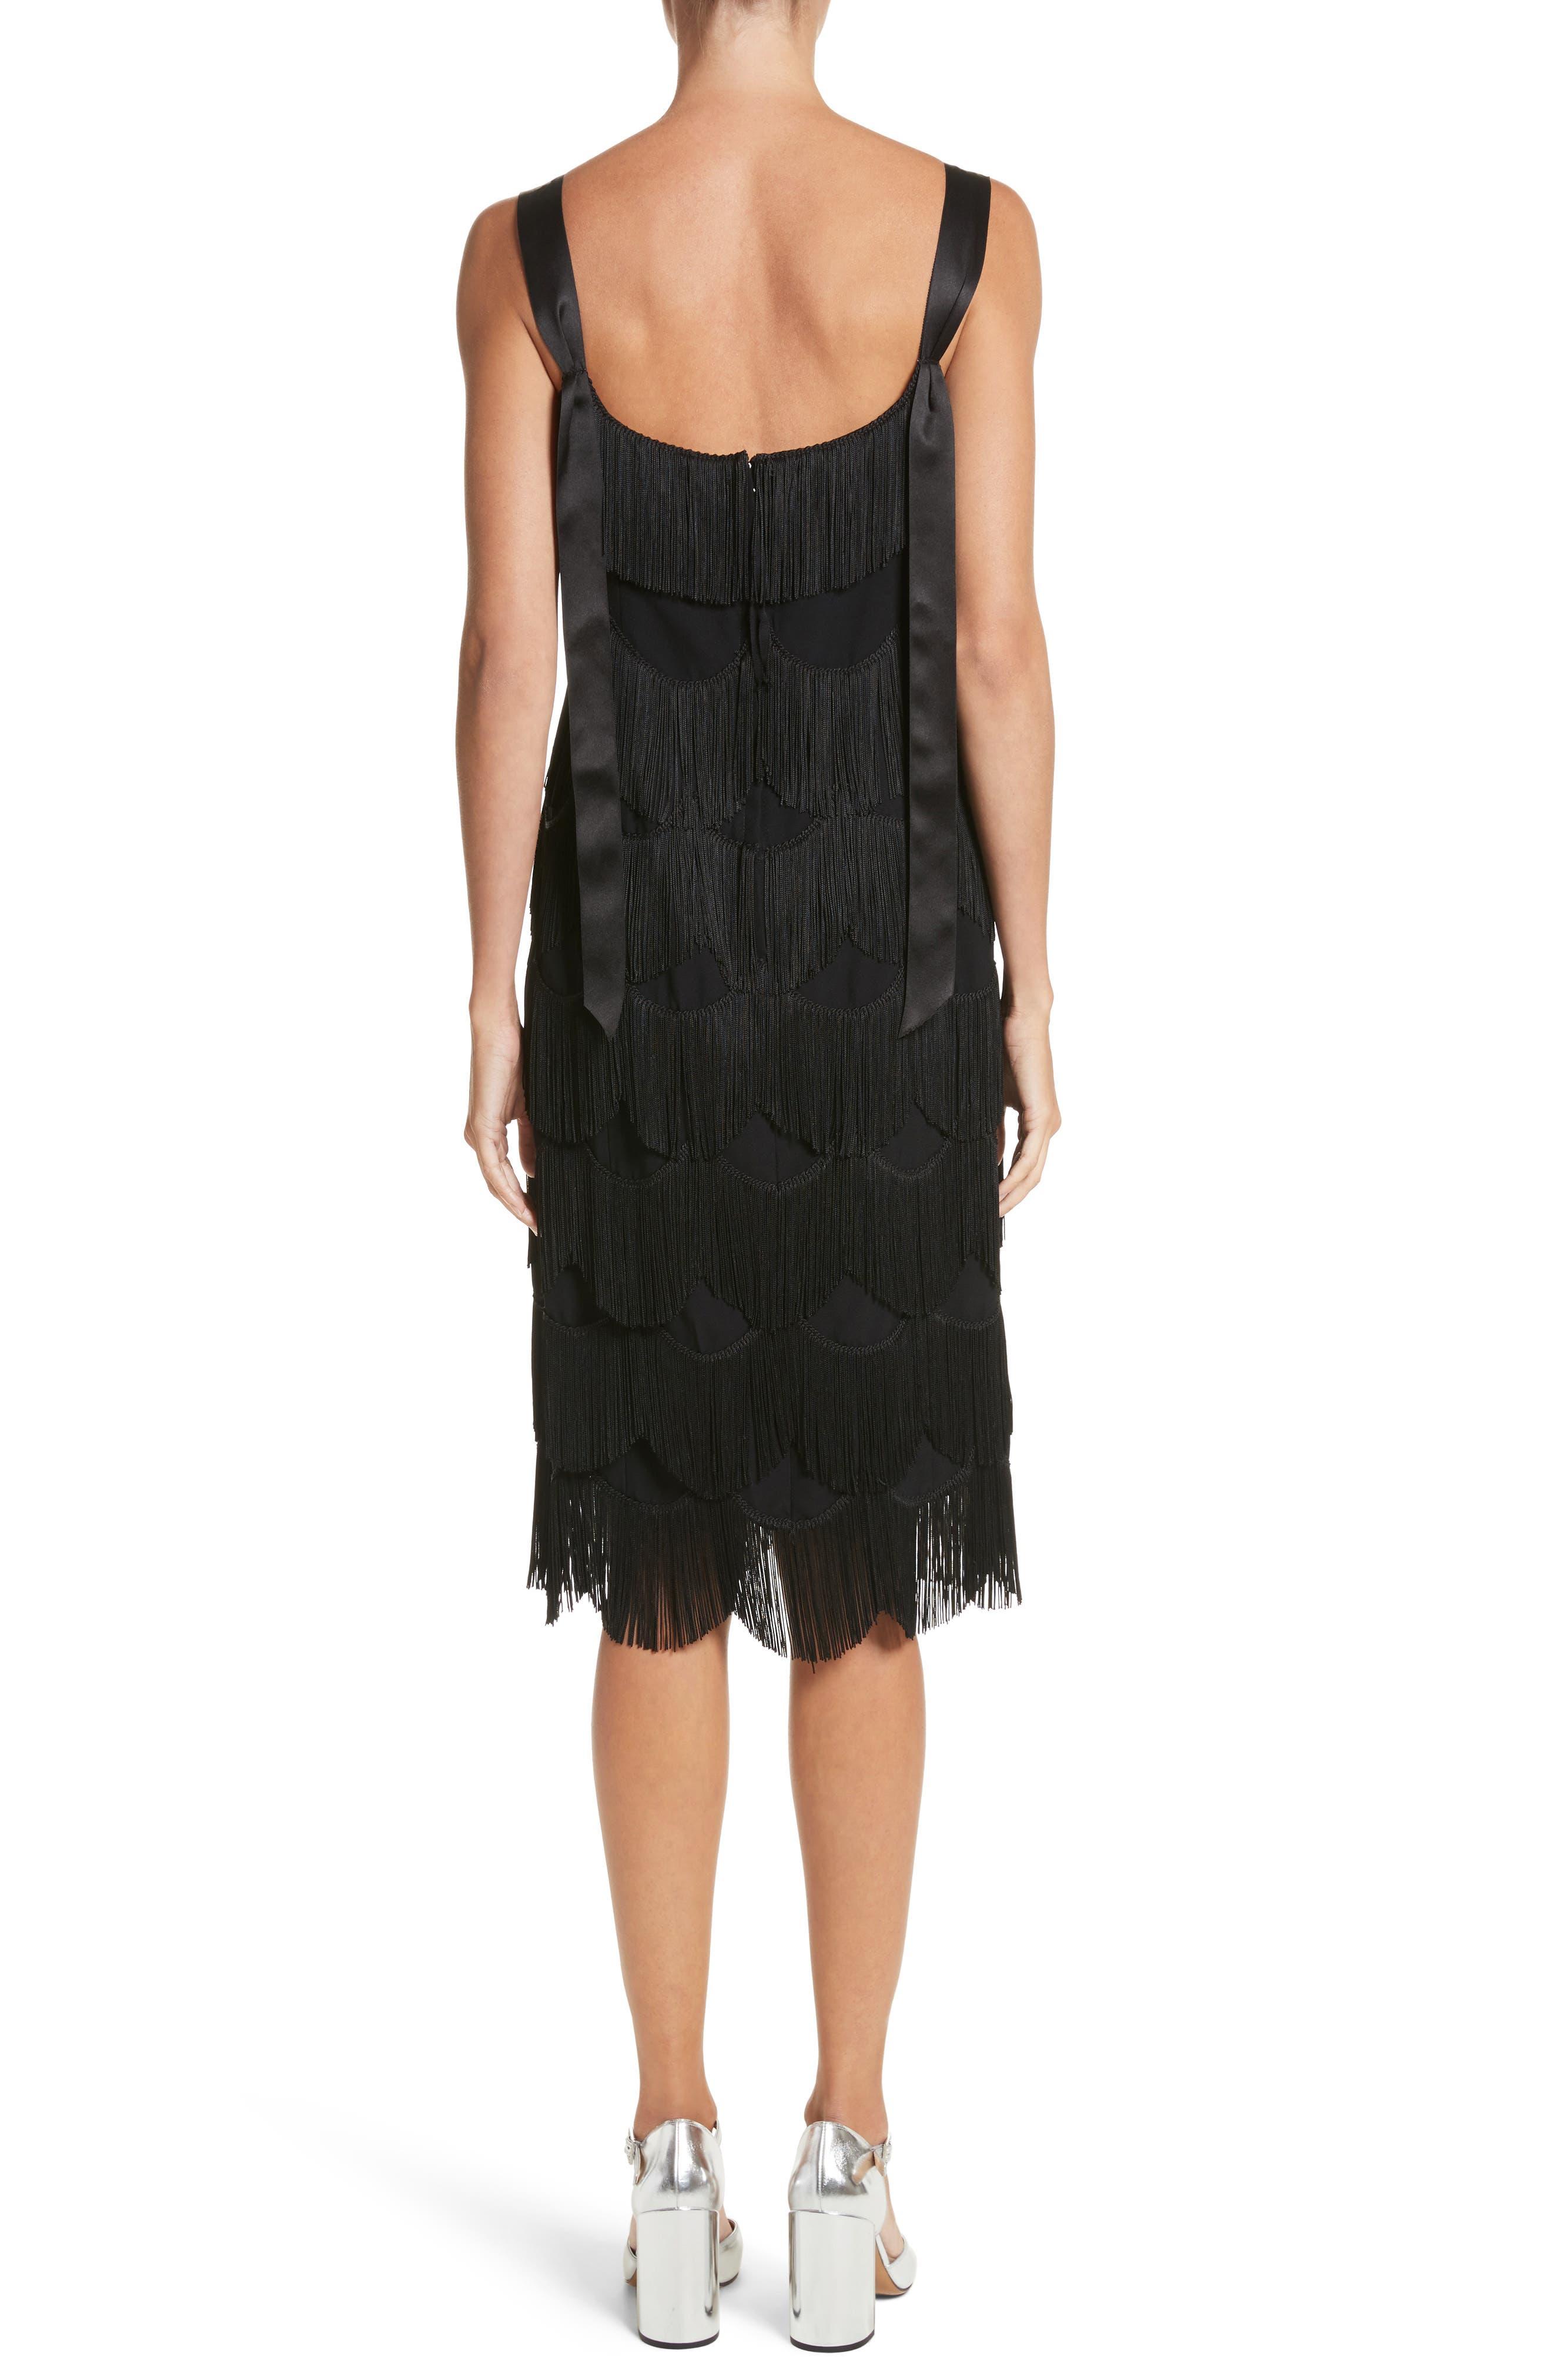 Scalloped Fringe Party Dress,                             Alternate thumbnail 2, color,                             001